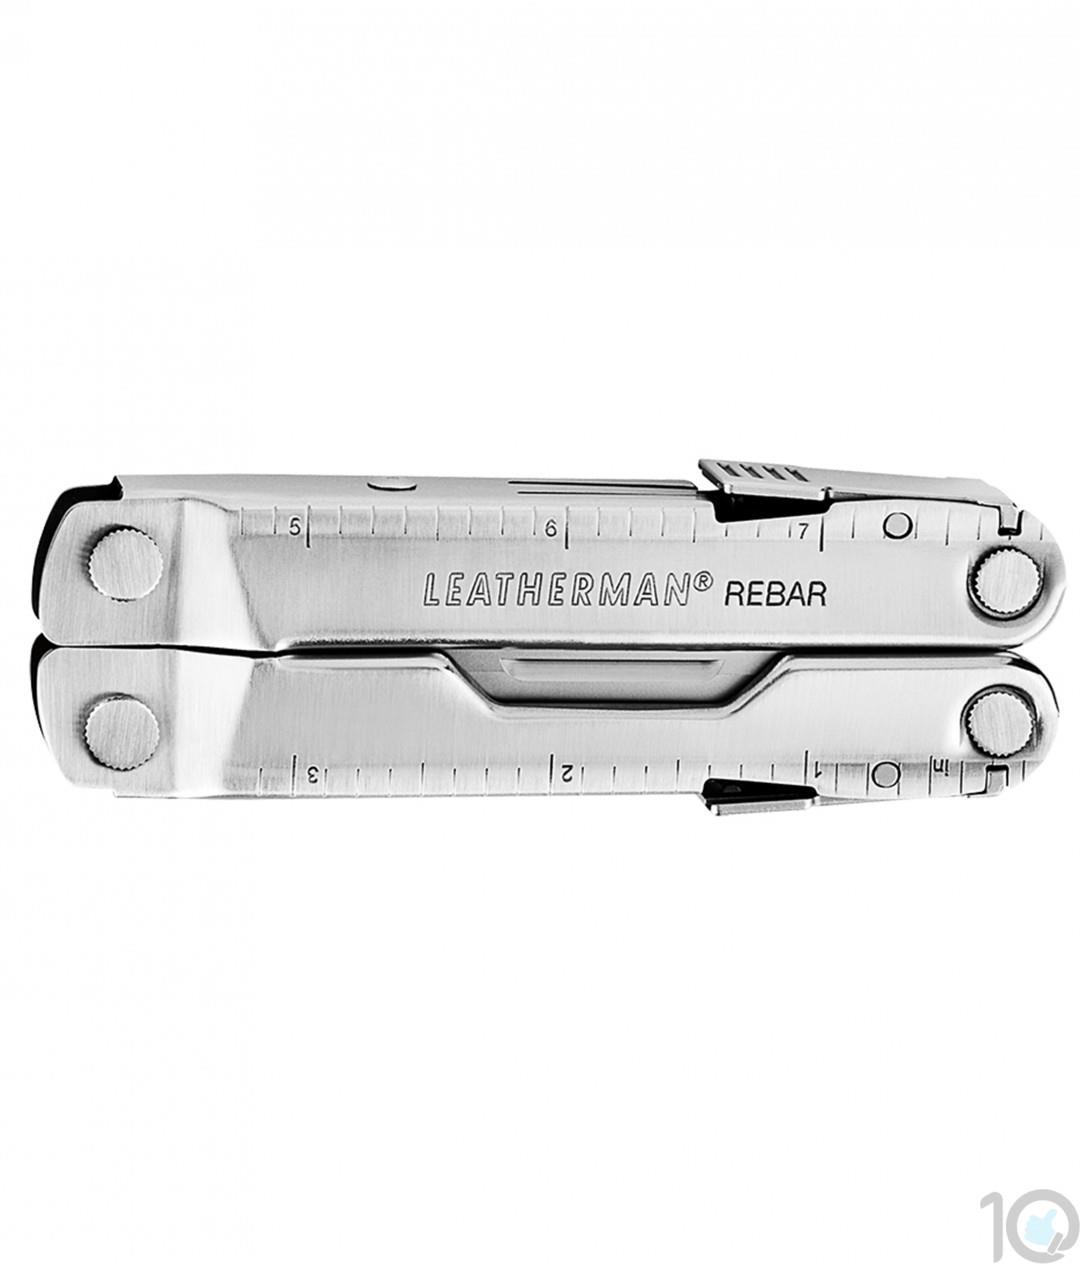 Leatherman Rebar Tool (Deri Kılıflı) Lea831560